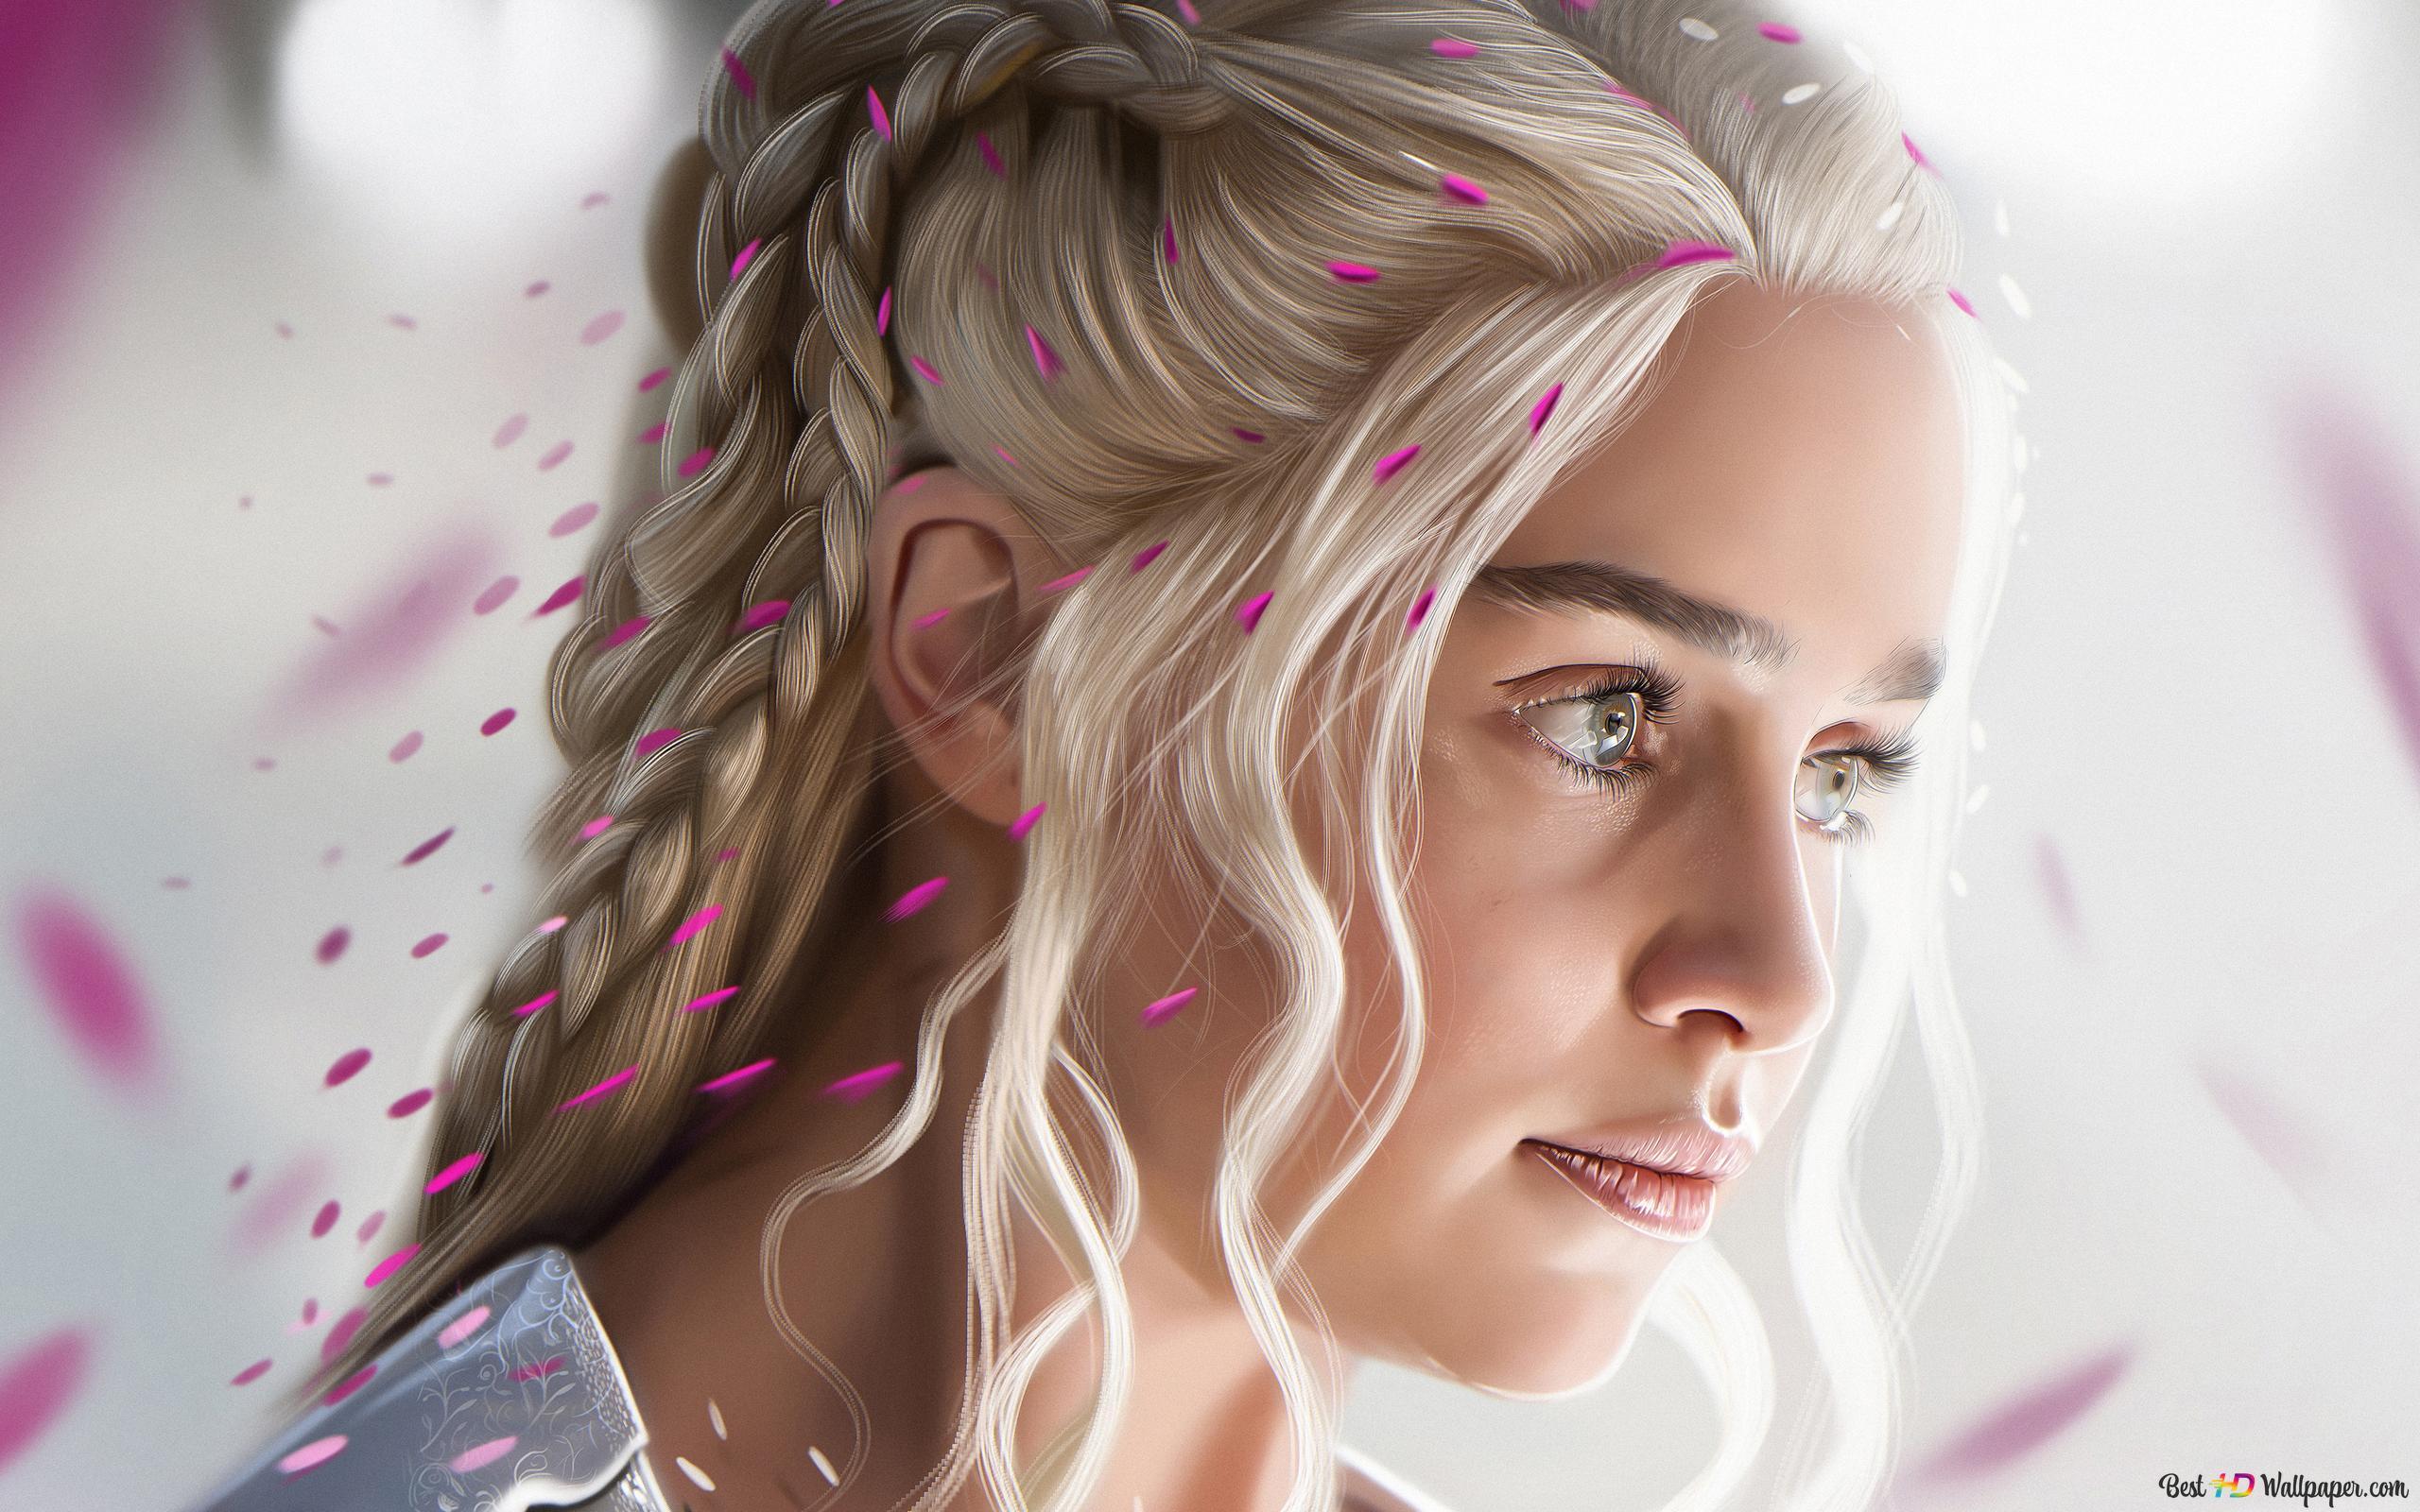 Daenerys Stormborn Of The House Targaryen Hd Wallpaper Download